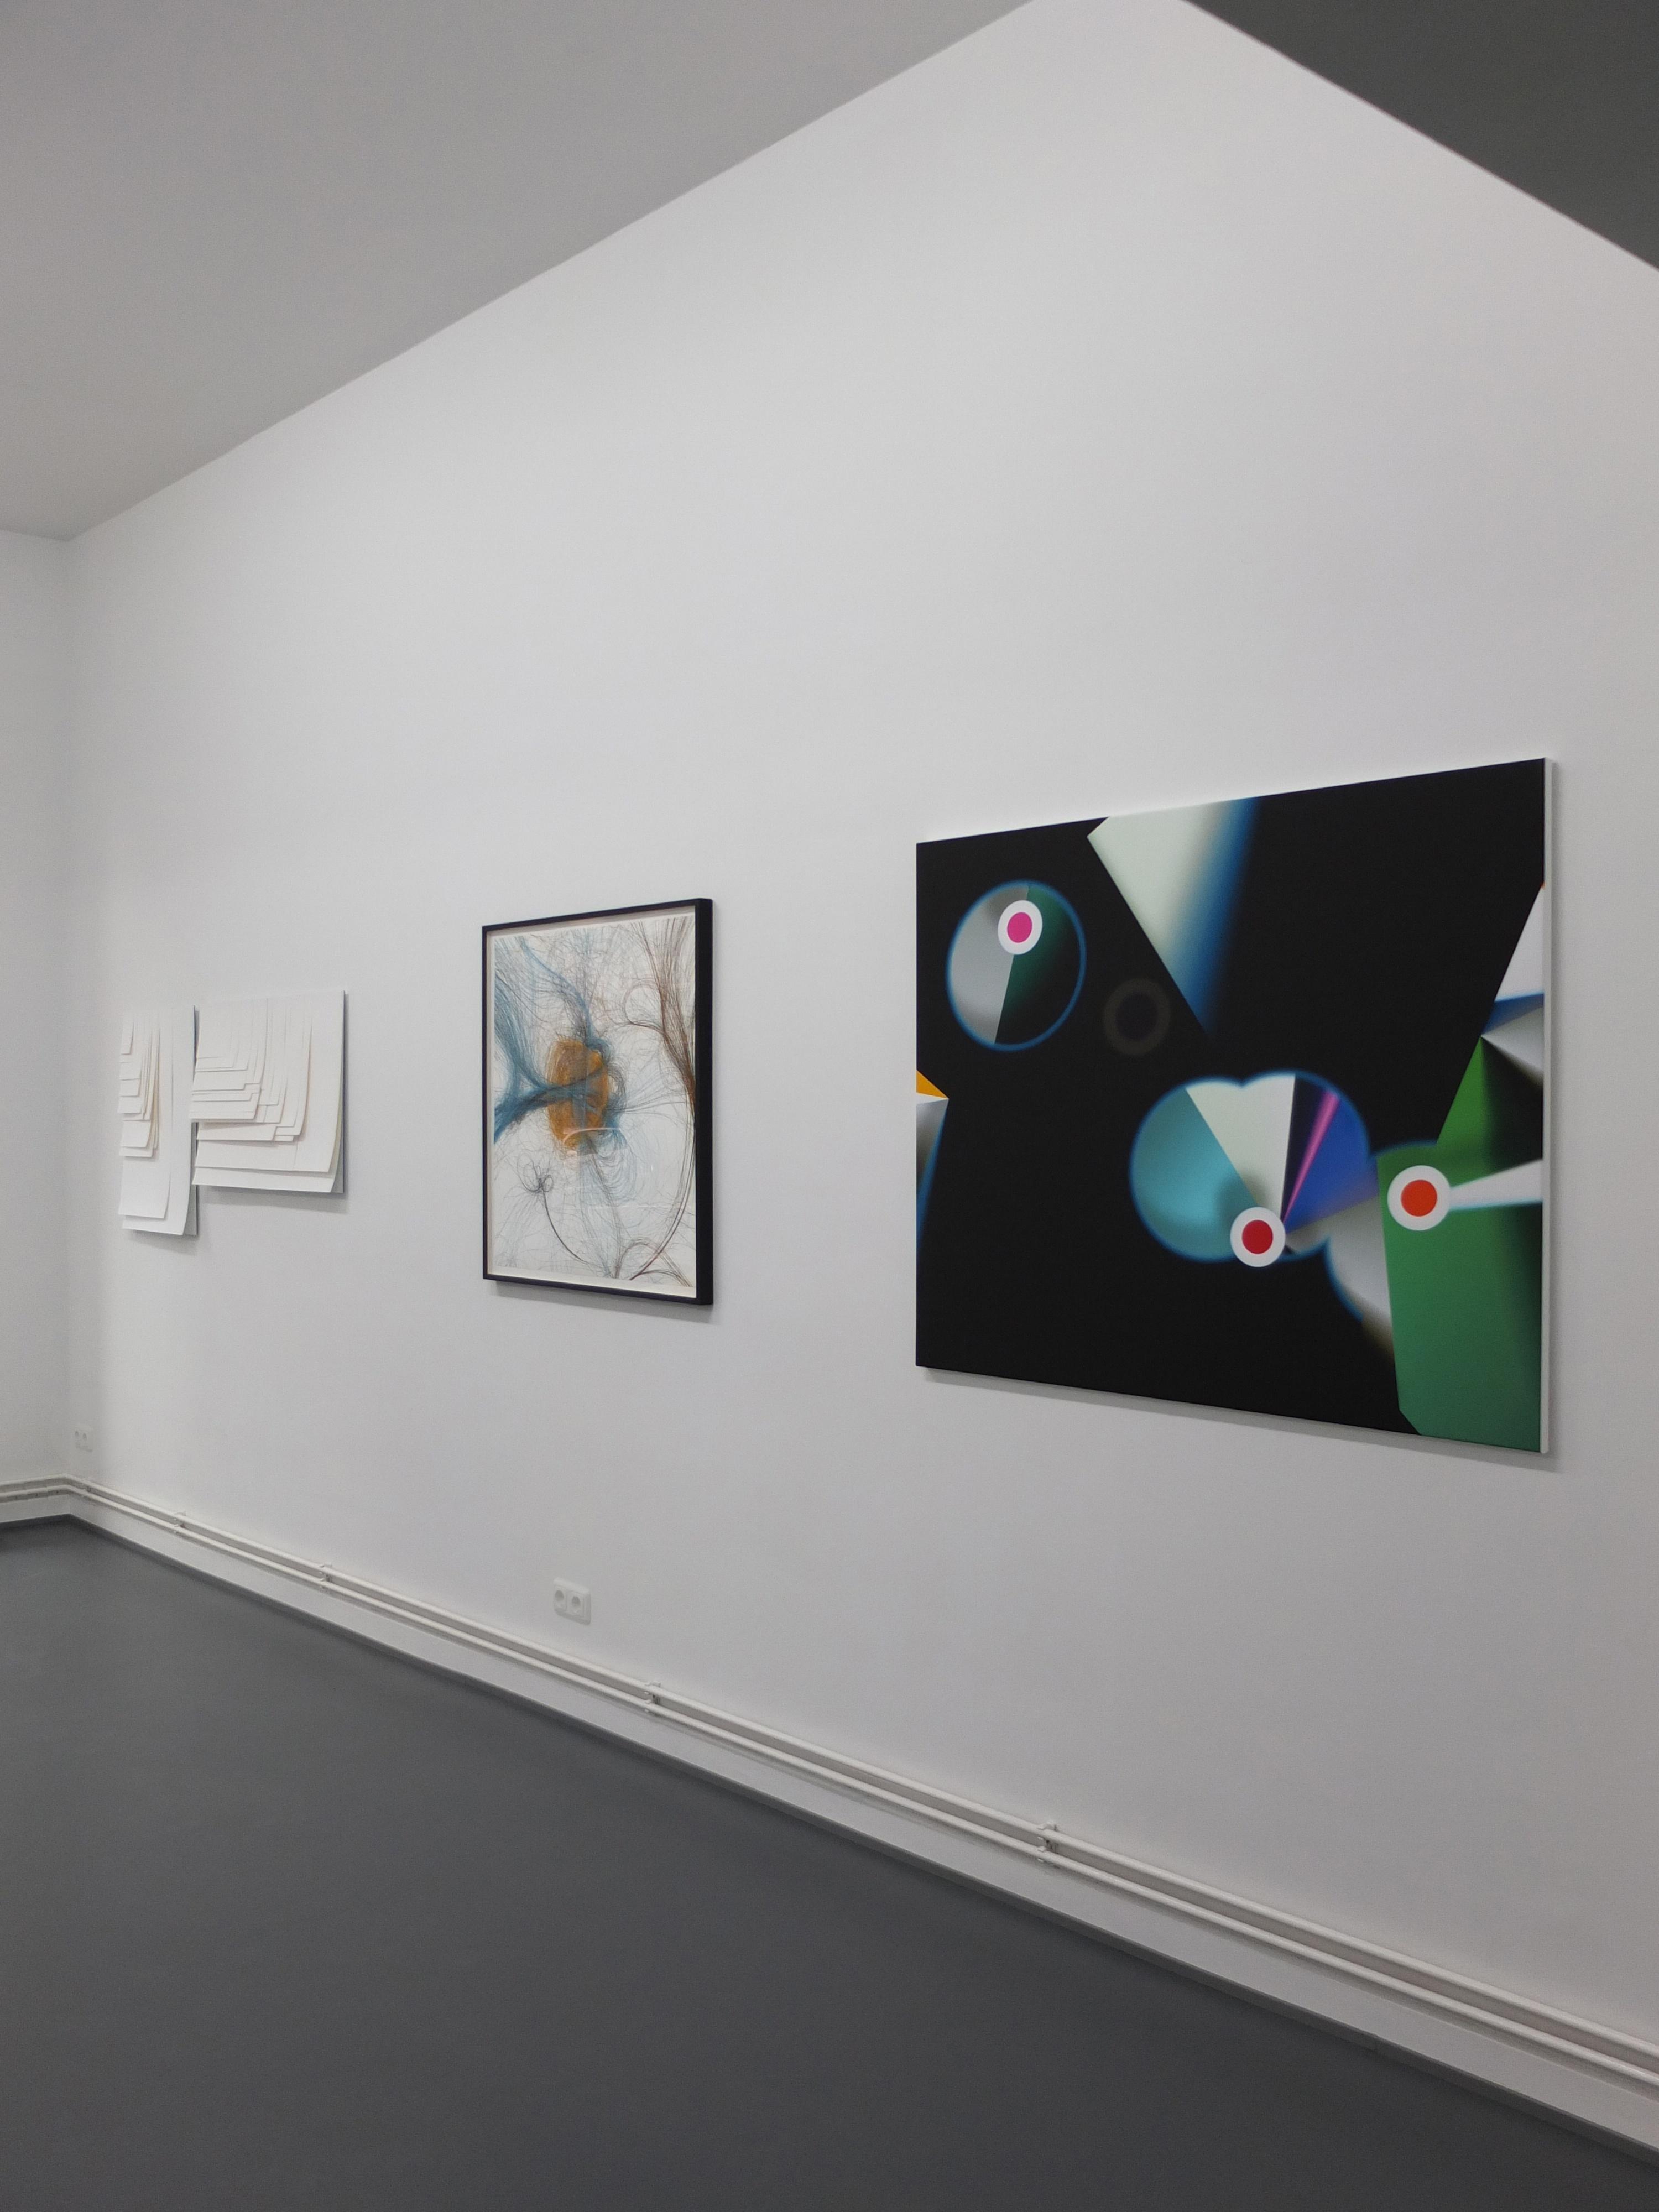 Back To Back, Gruppenausstellung, Frankfurt, 2013, Ausstellungsansicht